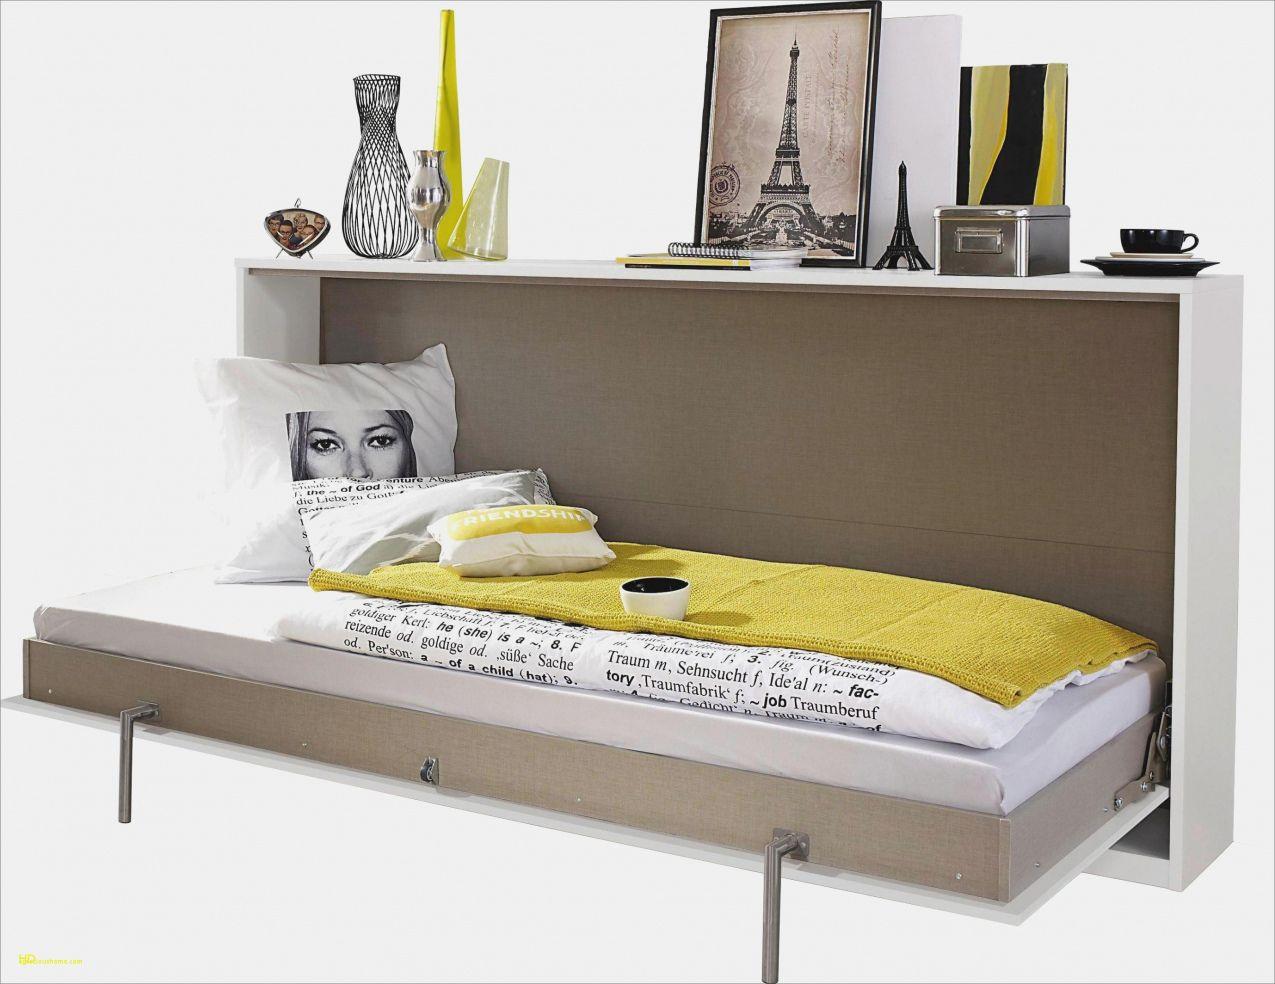 28 Ikea Housse De Couette 1 Personne 2019 Ikea Bedroom Furniture Bedroom Furniture Sets Bedroom Interior